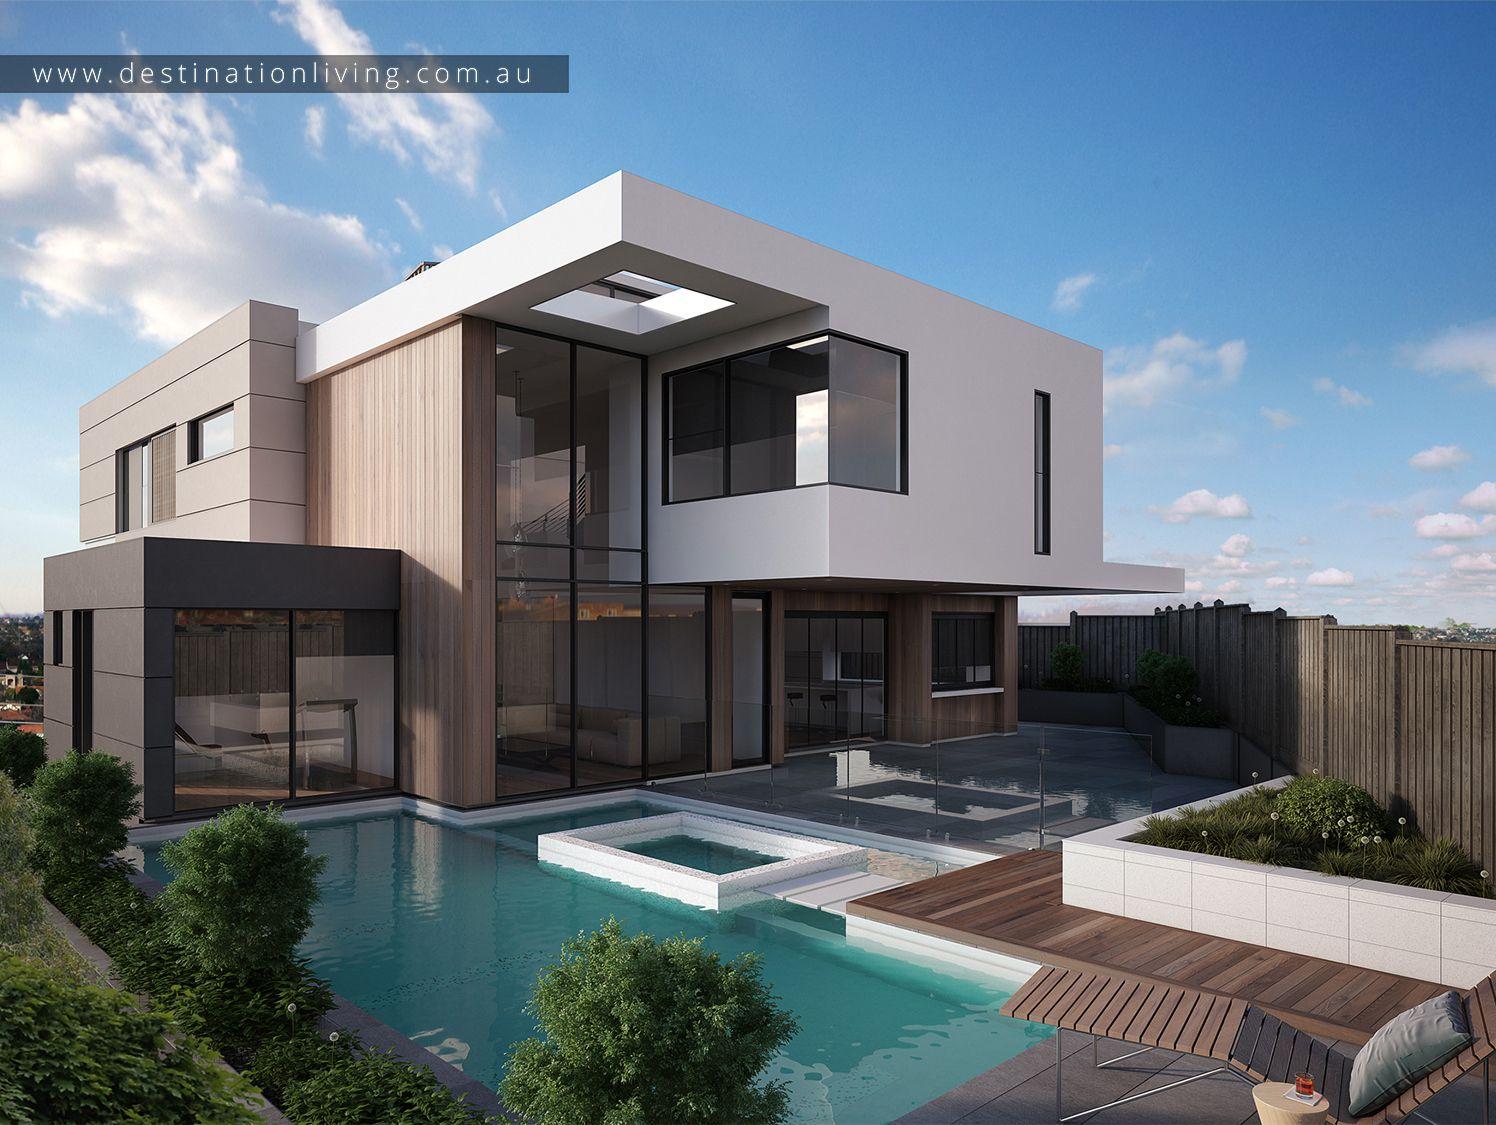 Destination living luxury pools decor pinterest luxury pools